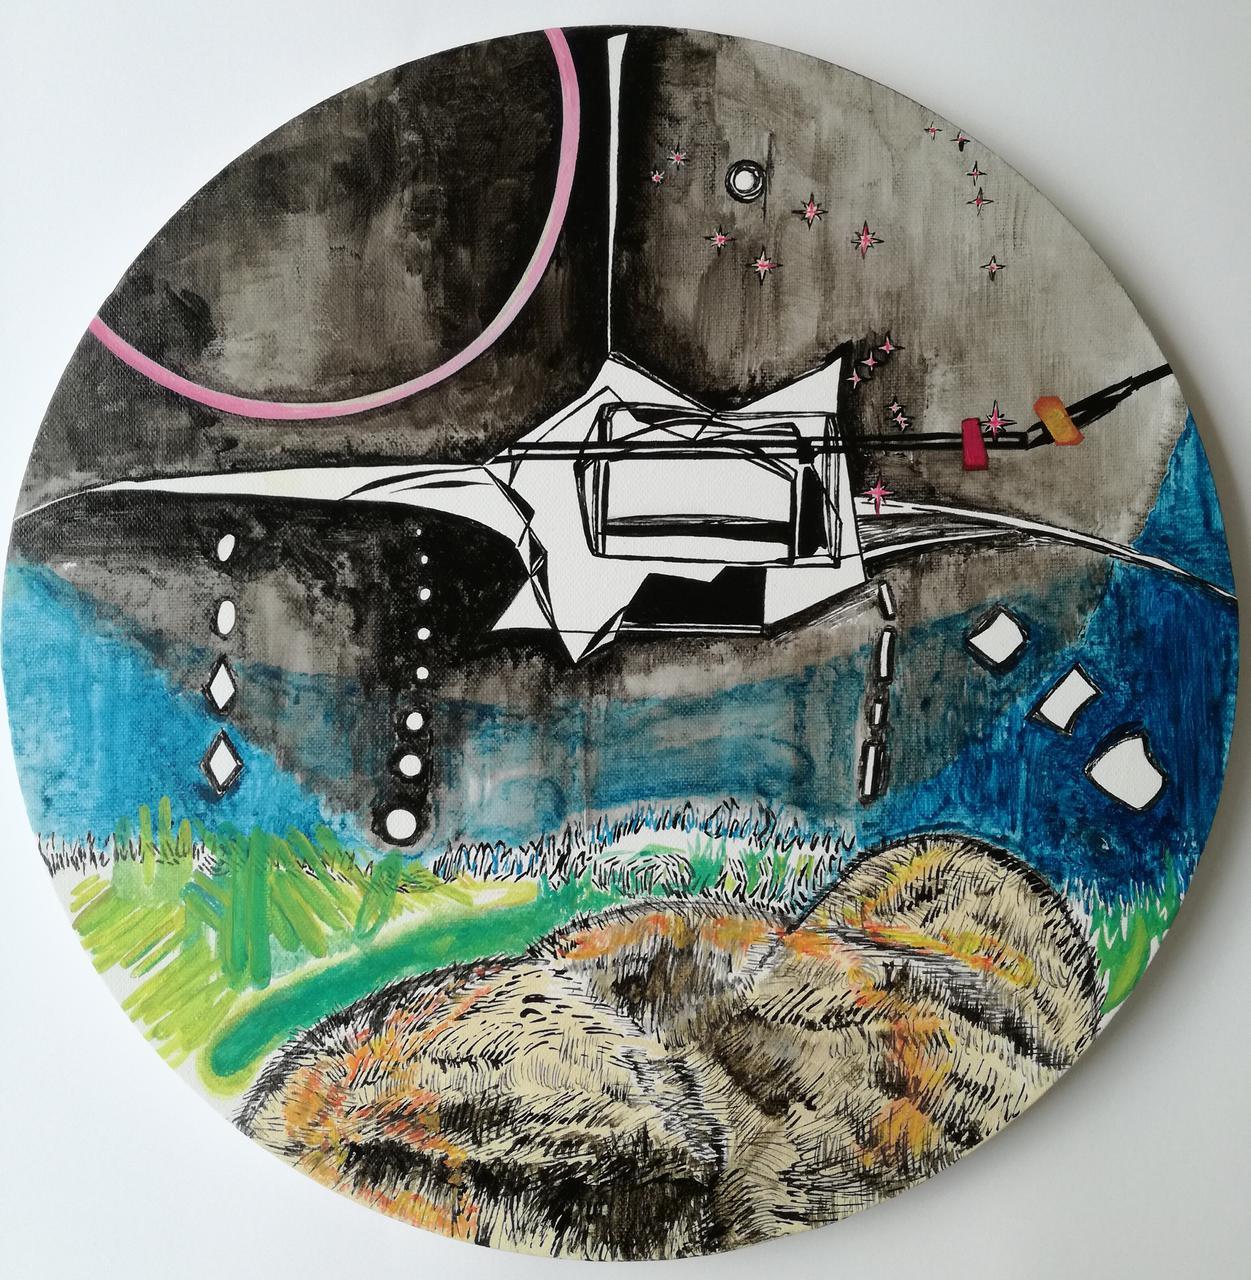 Vana Fertaki, Orion, diameter 45 cm, varnish and oil on canvas